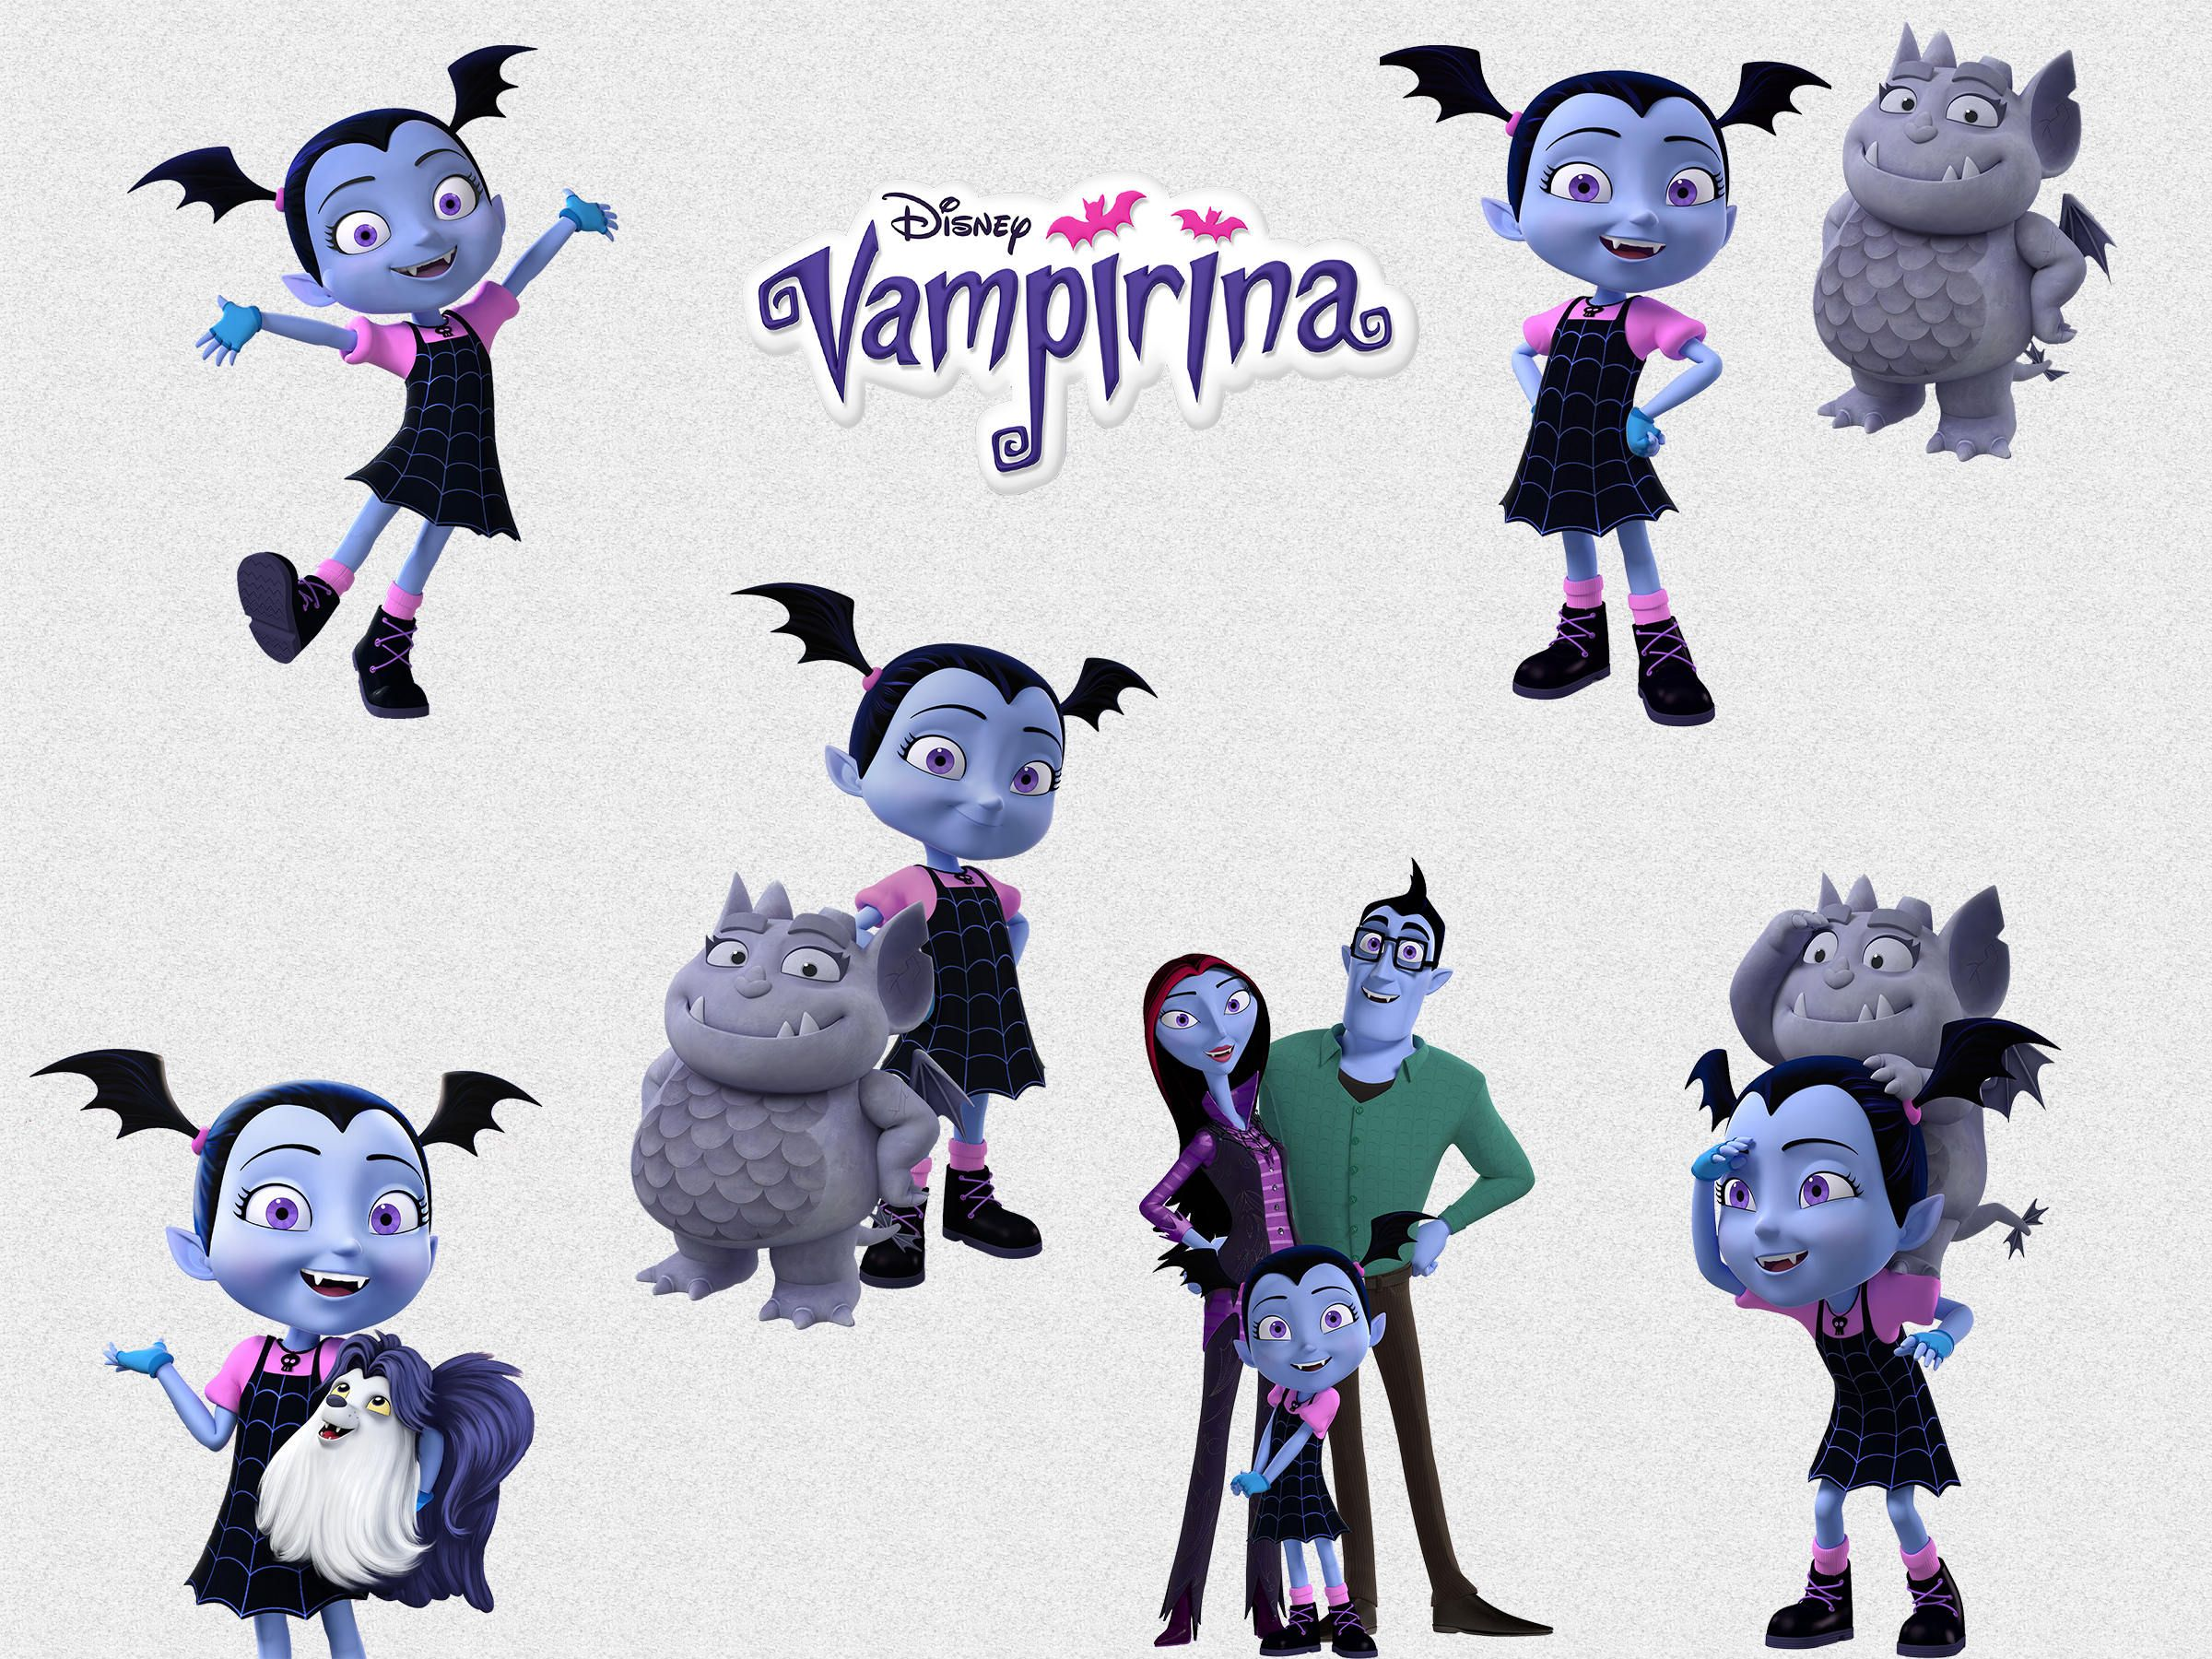 Vampirima clipart image stock VAMPIRINA CLIPART, 16 High Quality PNG Images, Clip Art ... image stock